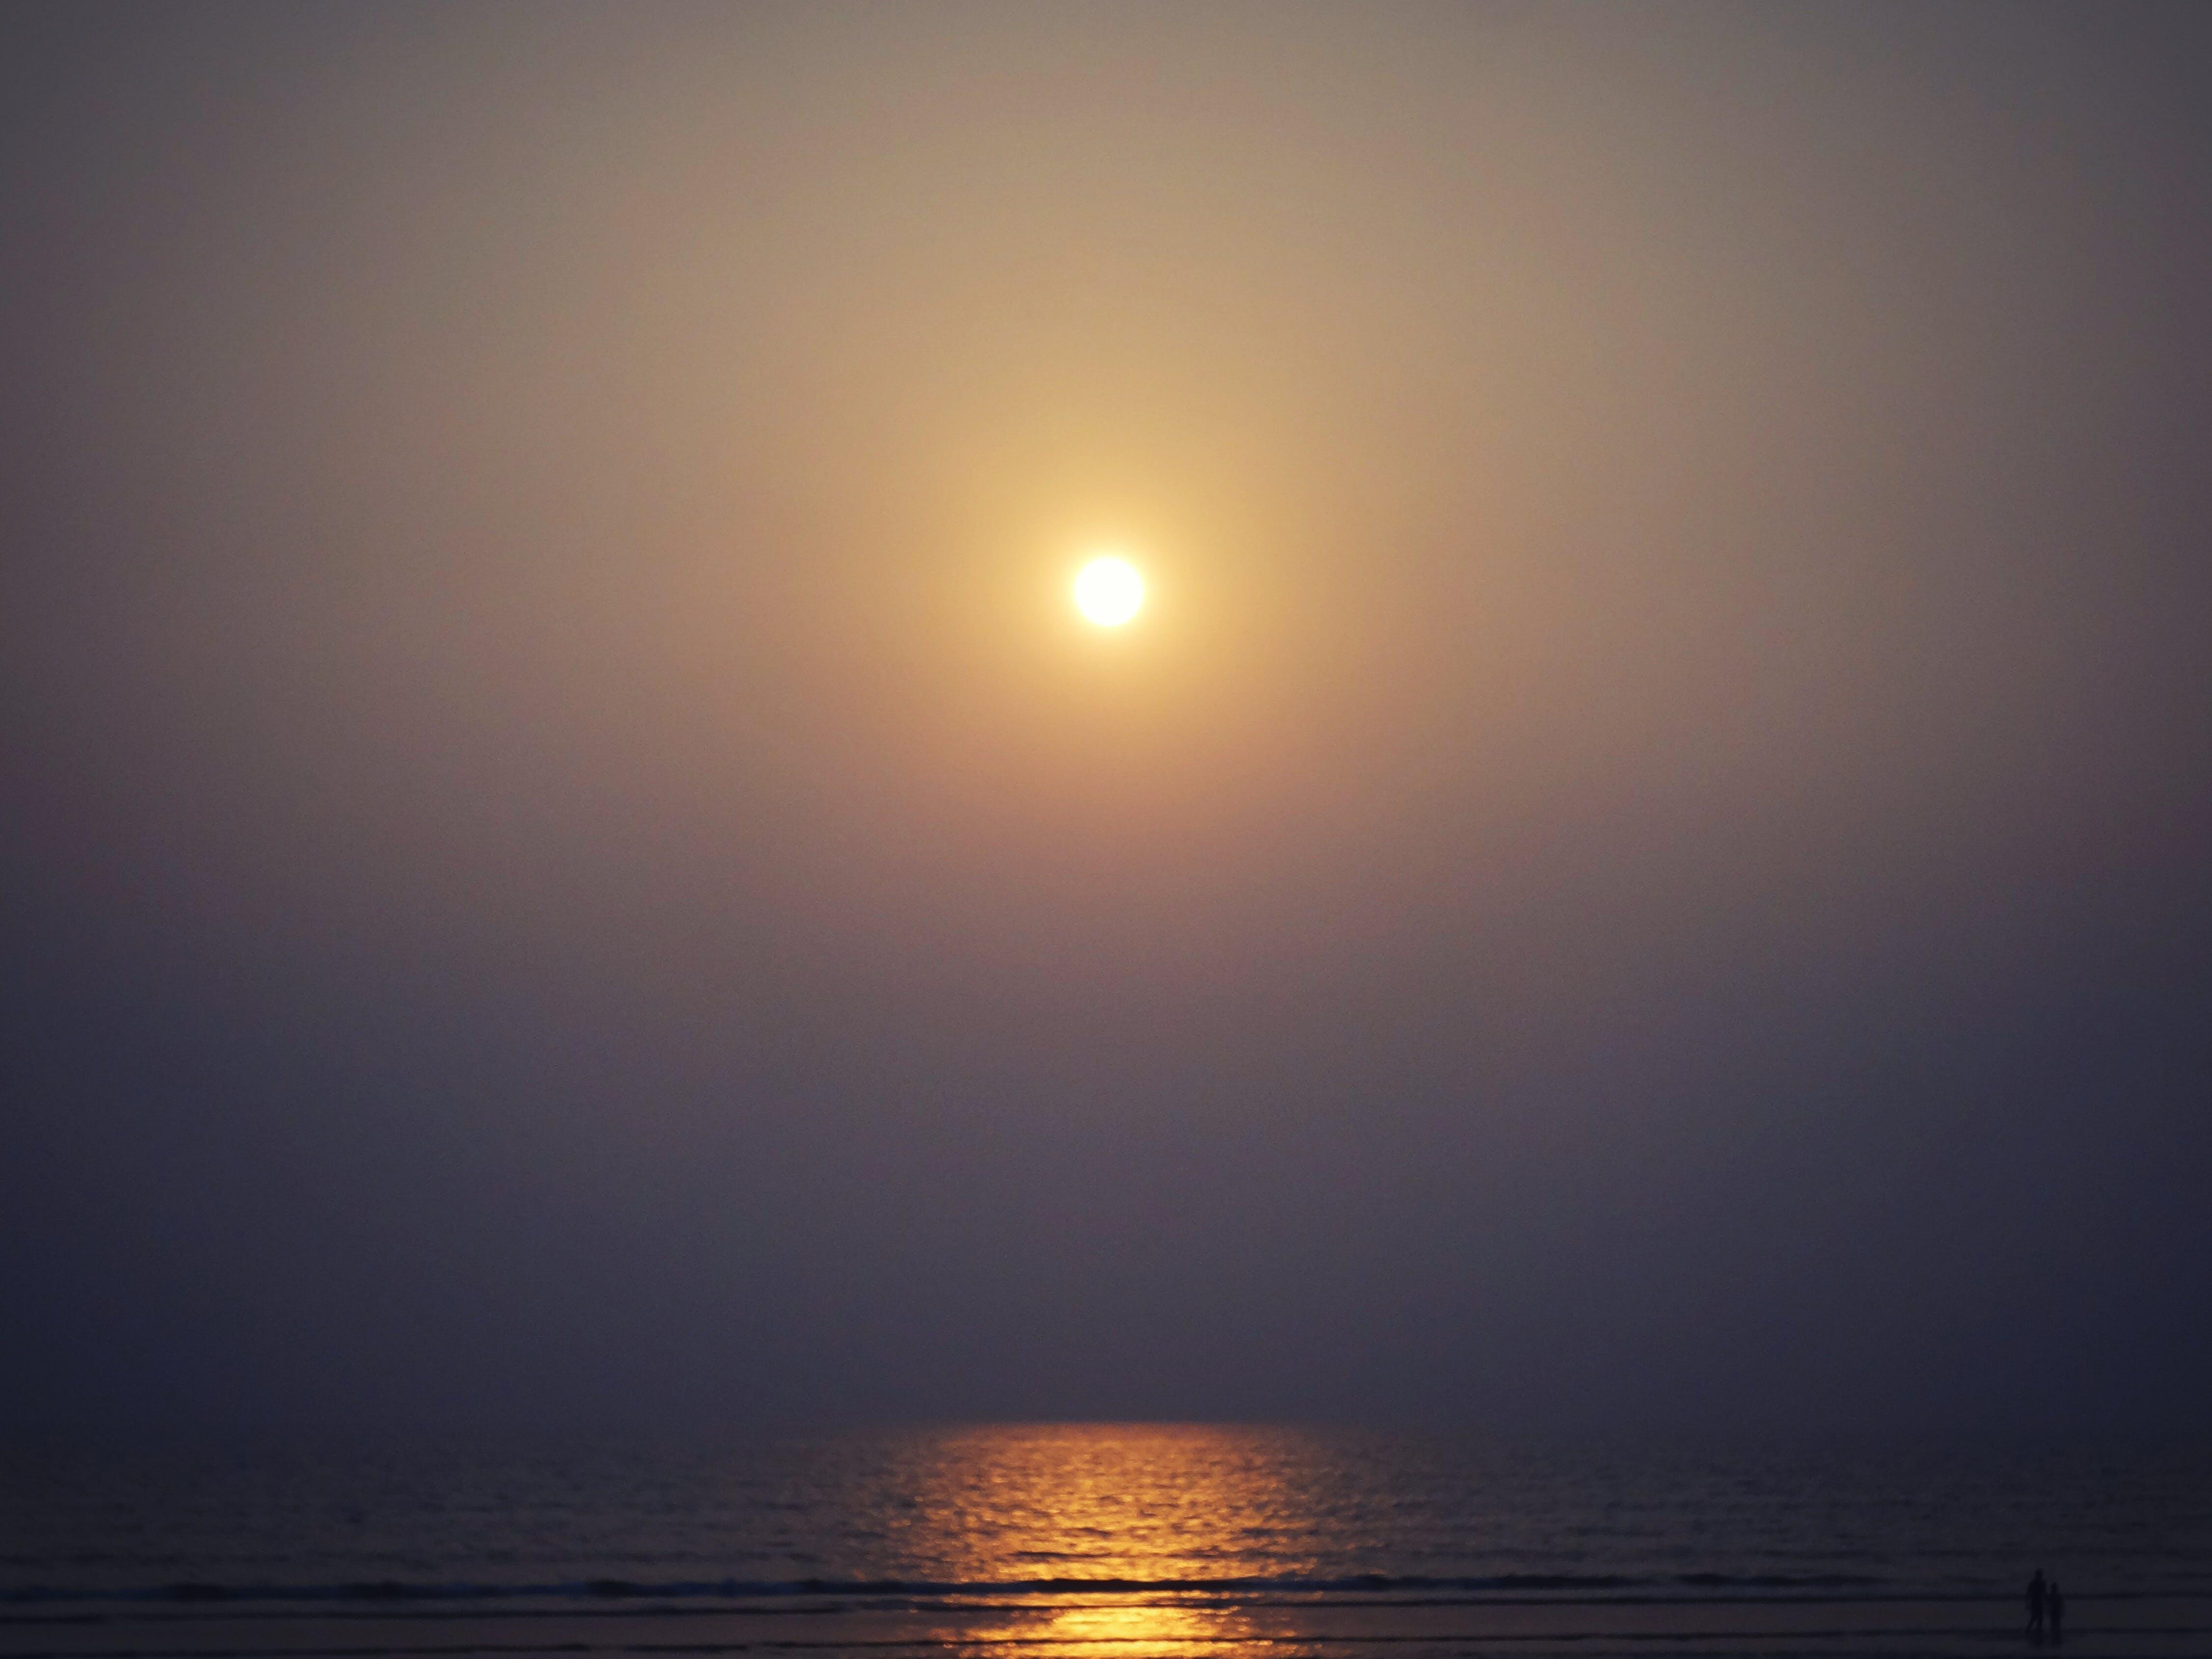 Free stock photo of beach, beach landscape, cox's bazar, golden sun